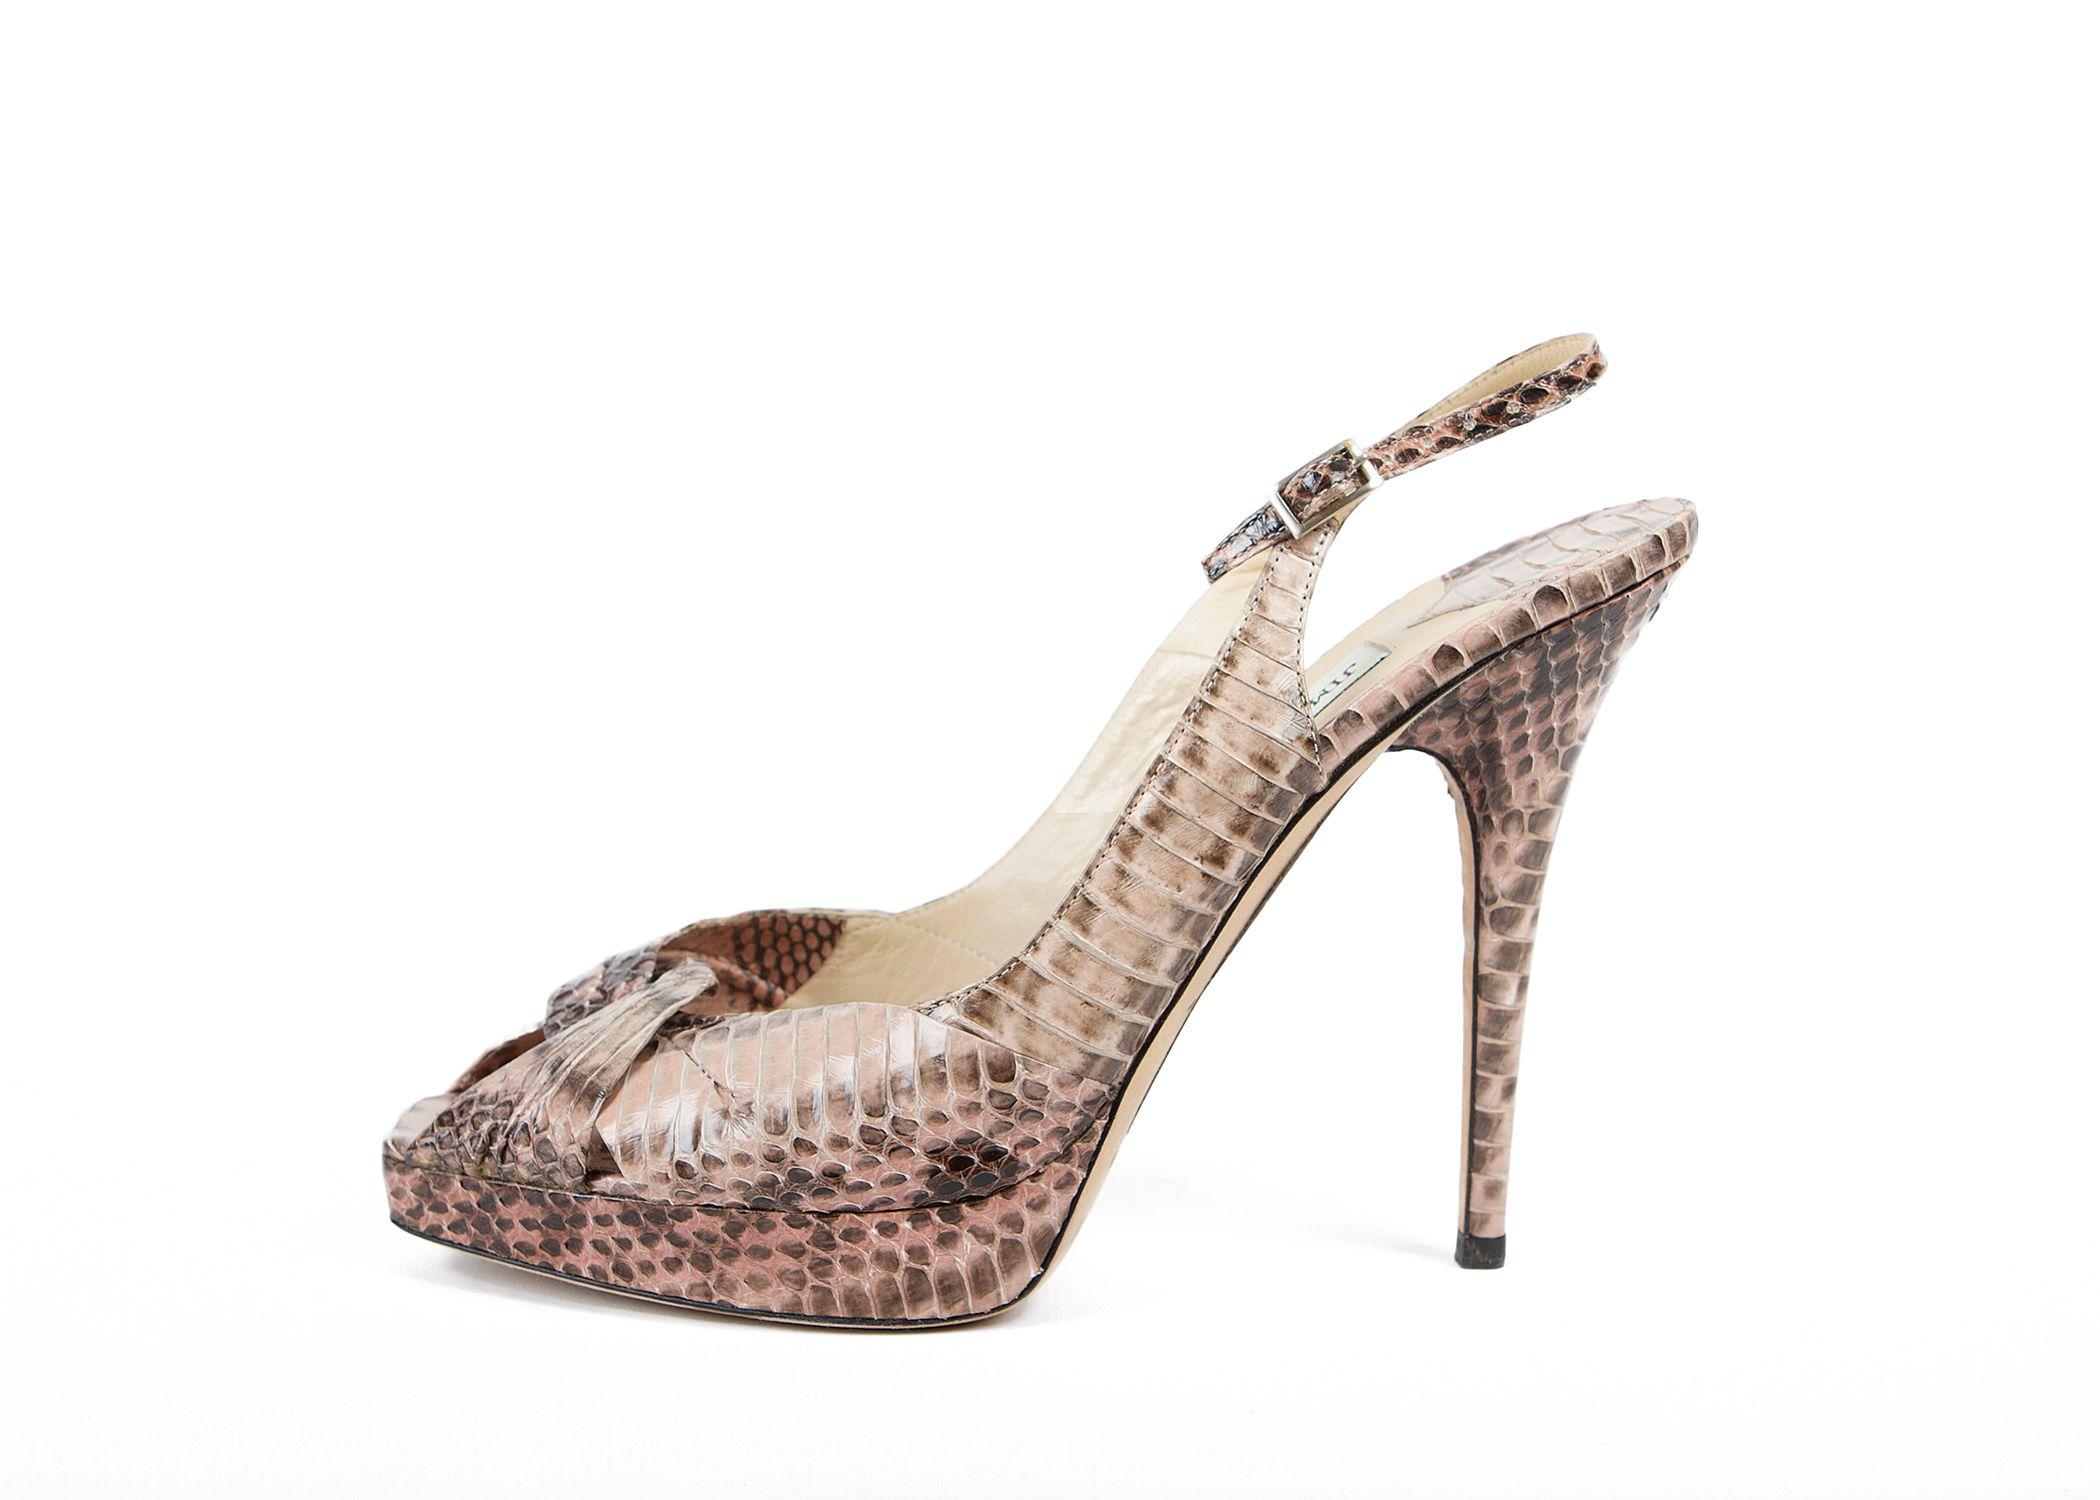 Jimmy Choo Snakeskin Sandals | LePrix